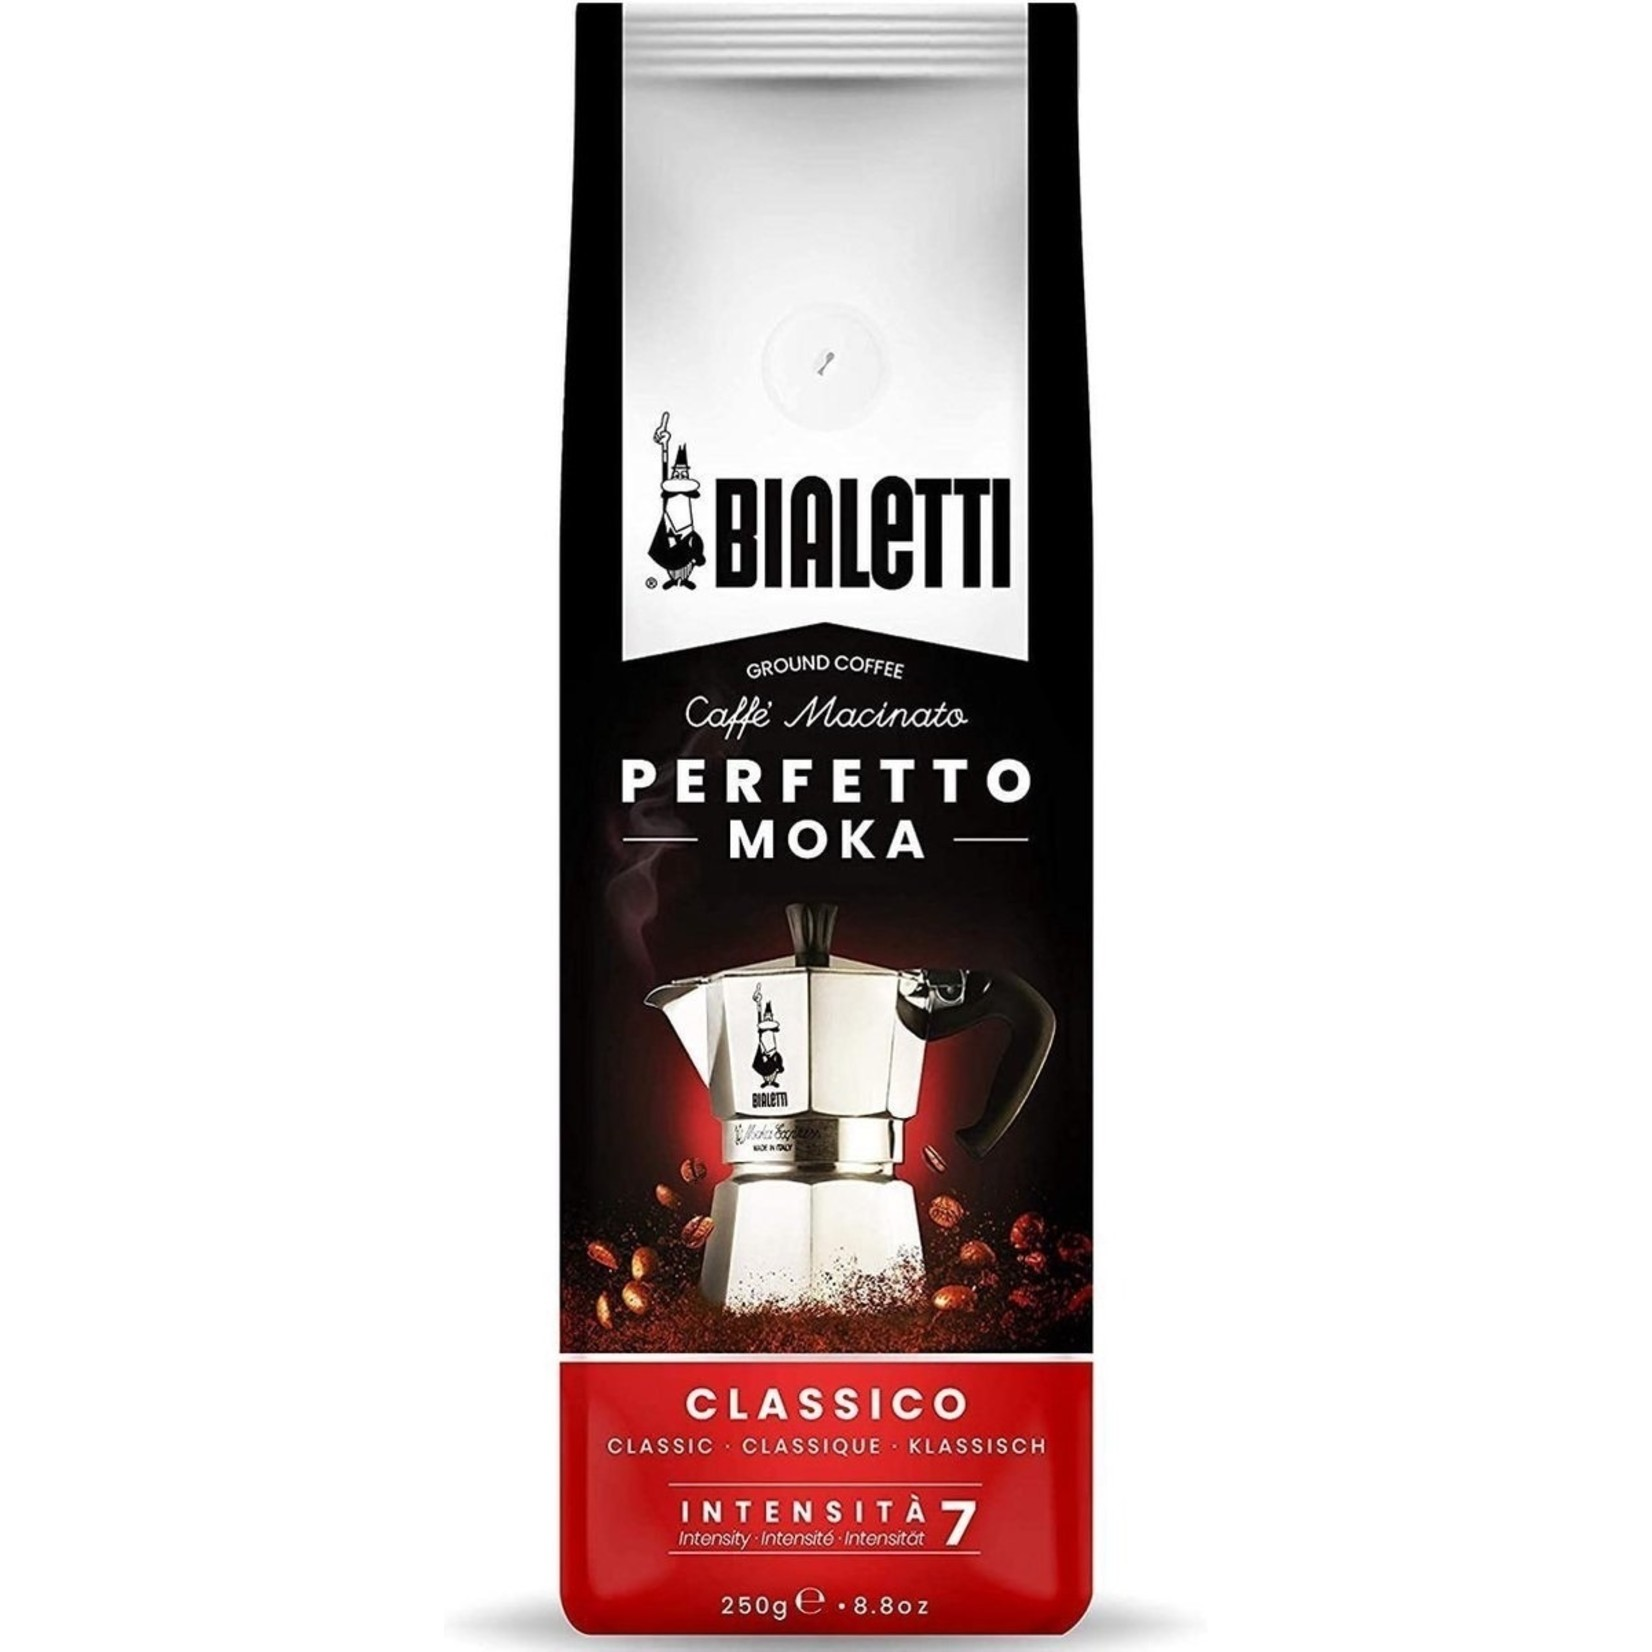 Bialetti Bialetti Perfetto Moka Classico, gemalen koffie, 250g